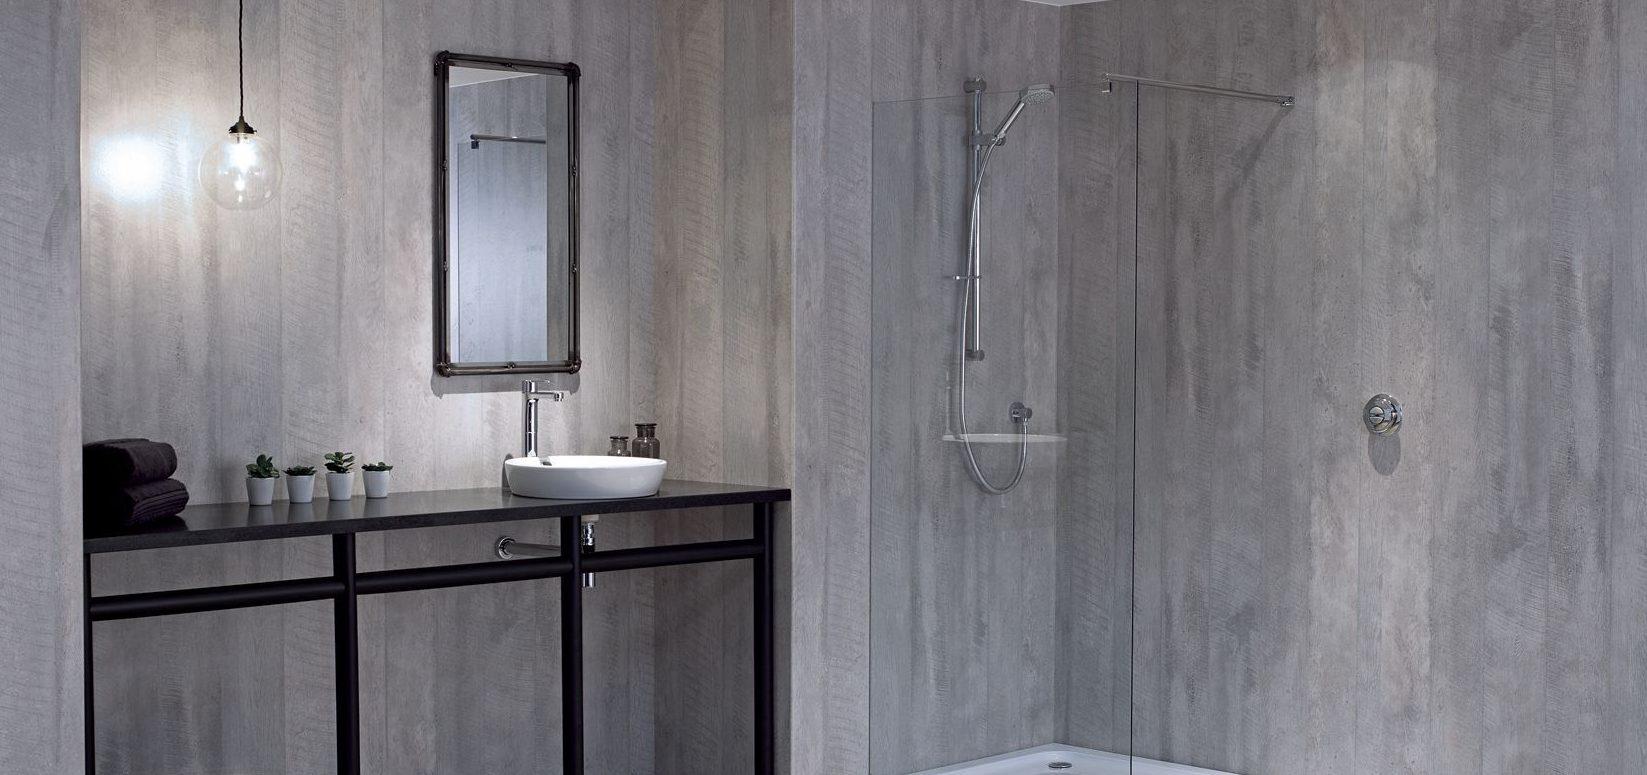 Bushboard Nuance Designer Bathroom Wall Panels